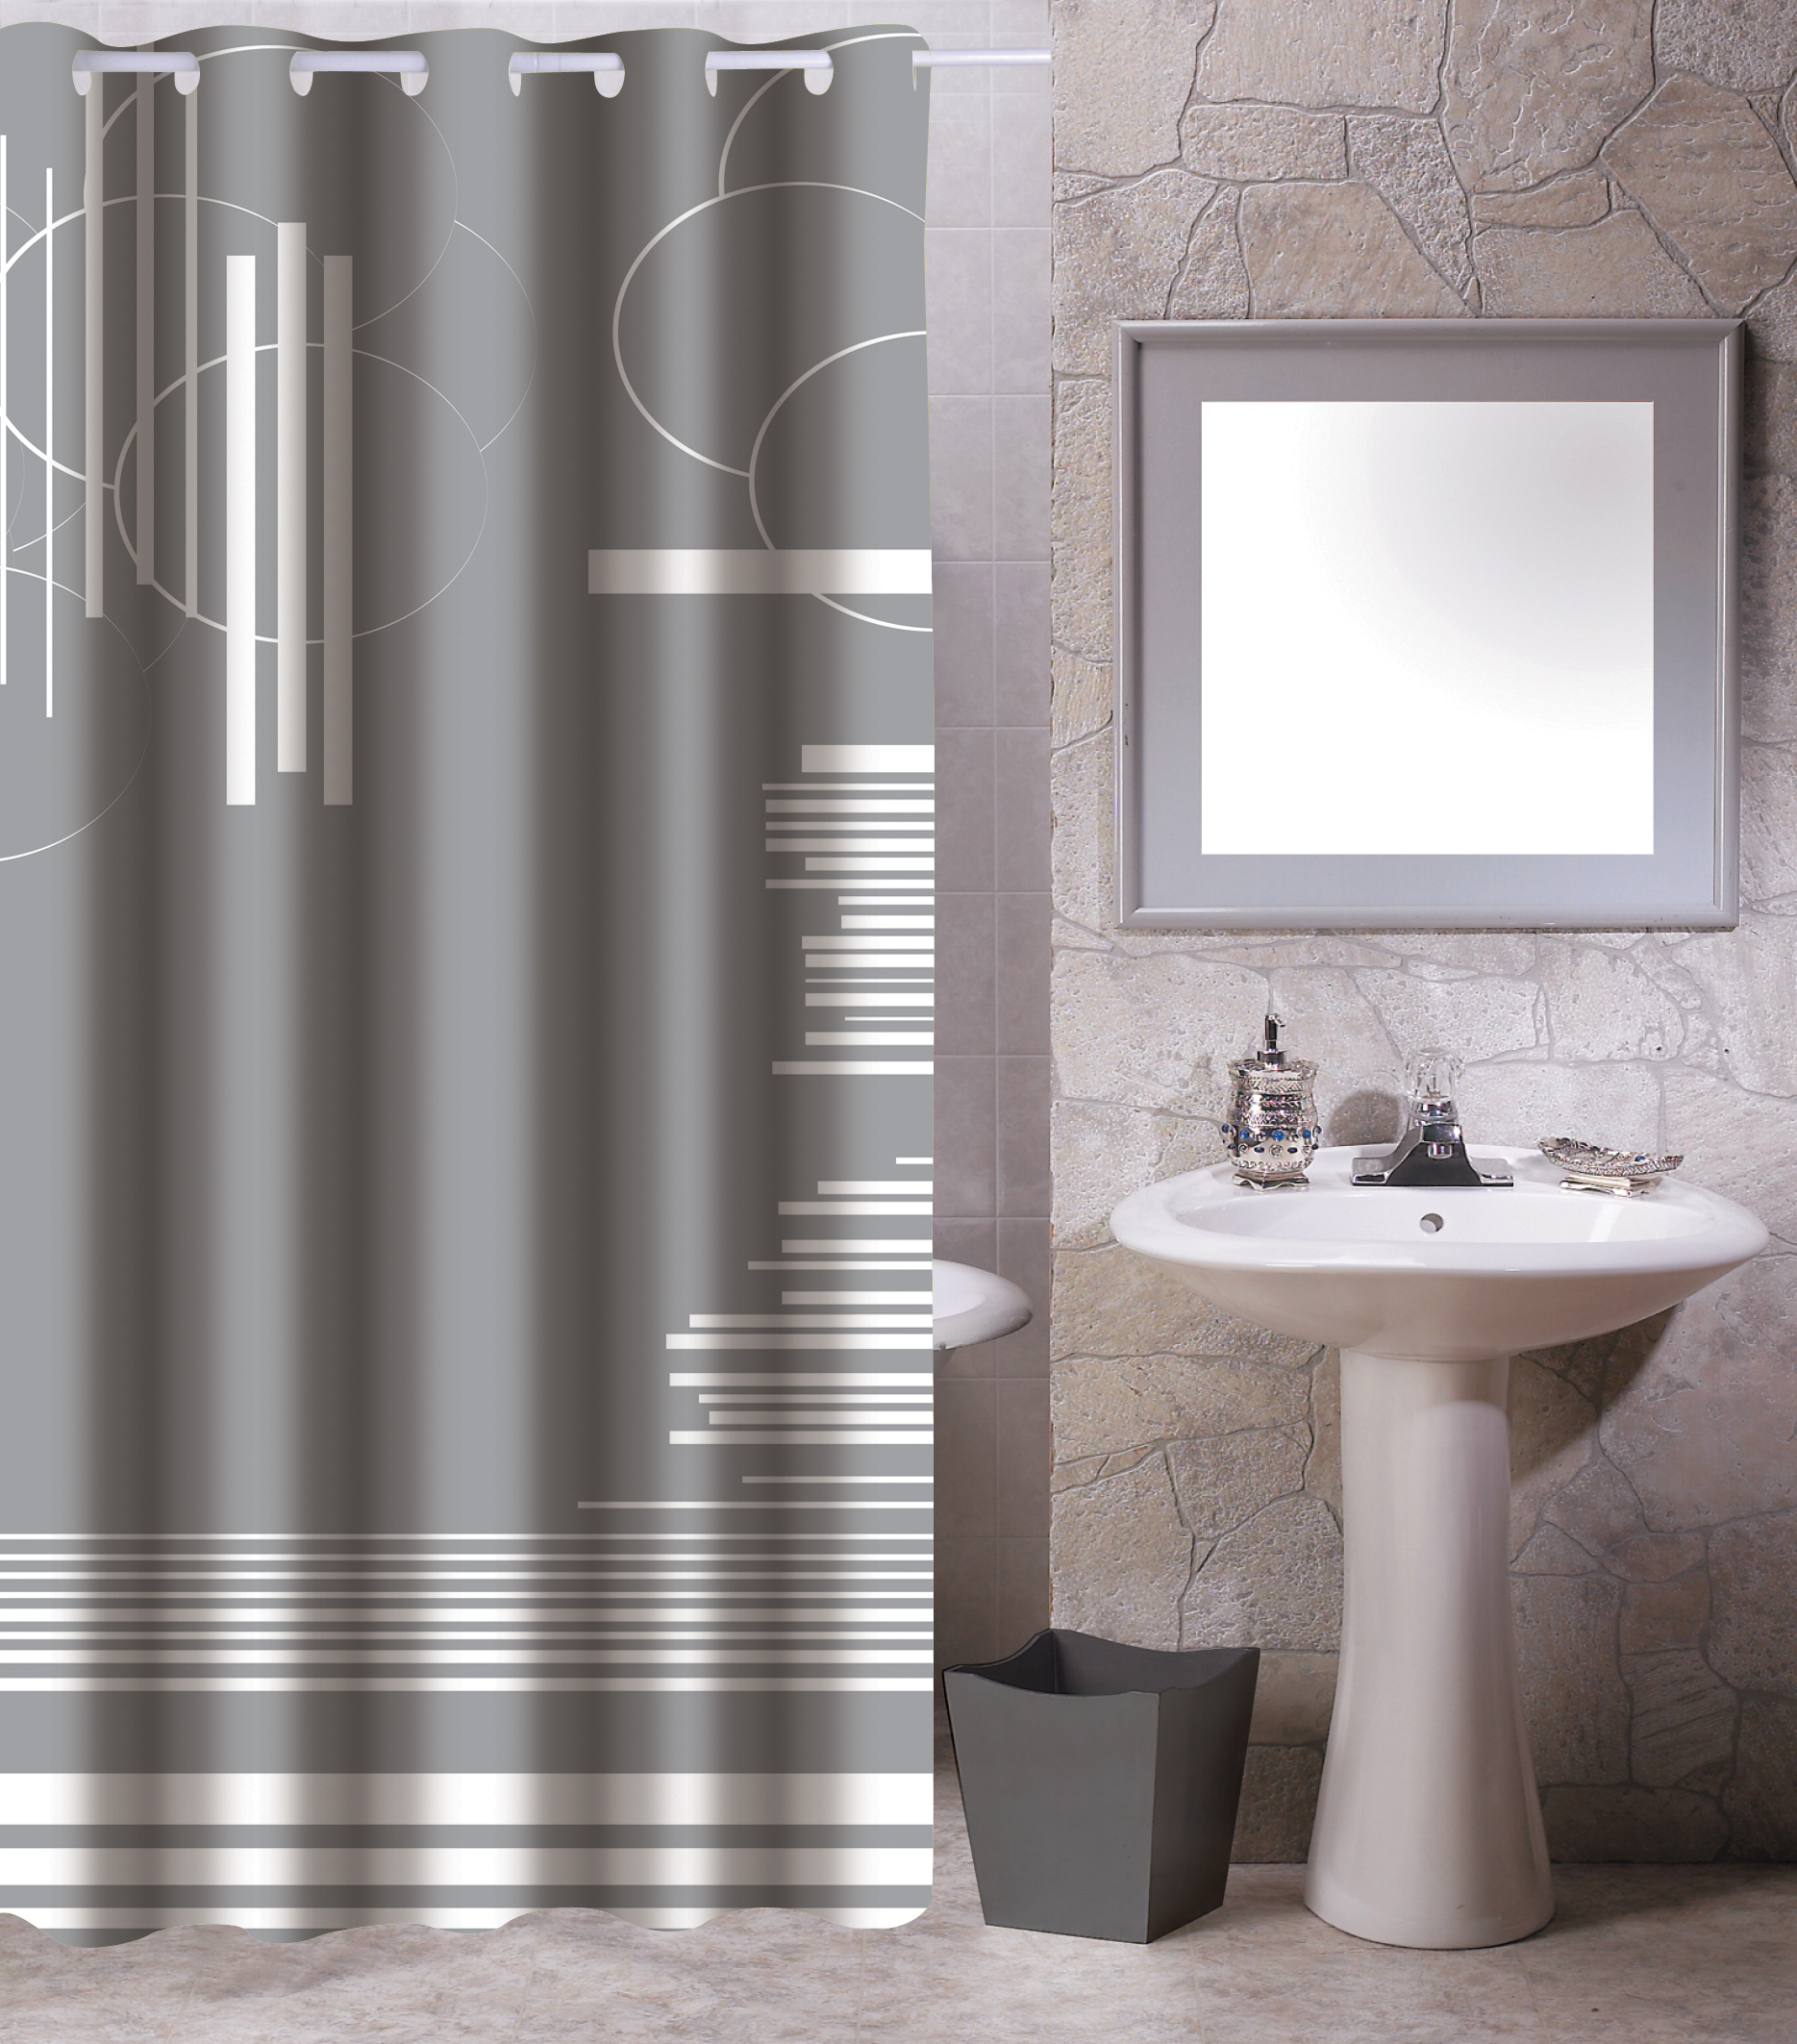 MSV Duschvorhang 180x200cm Anti Schimmel Textil Badewannenvorhang Wannenvorhang Graphics Grau